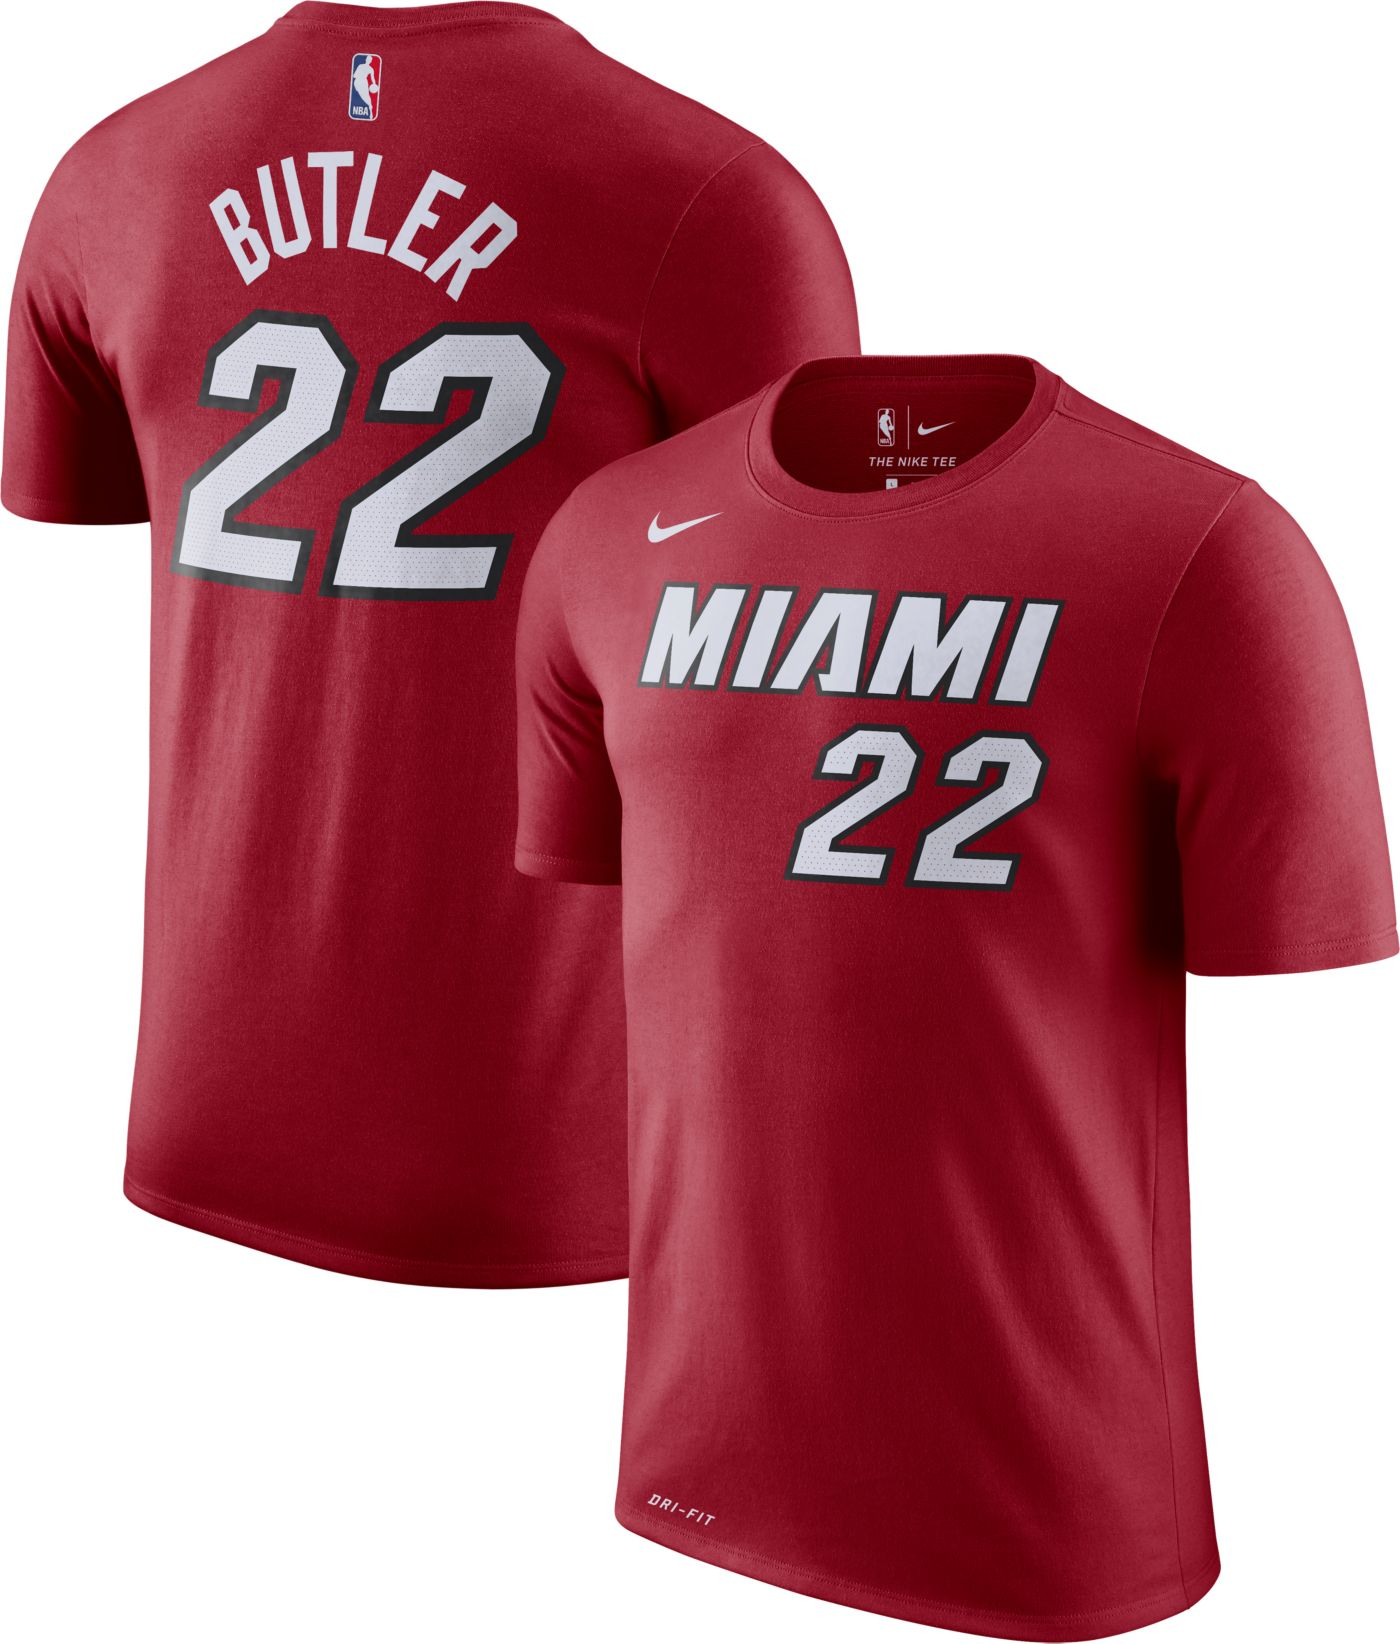 Nike Men's Miami Heat Jimmy Butler #22 Dri-FIT Burgundy T-Shirt